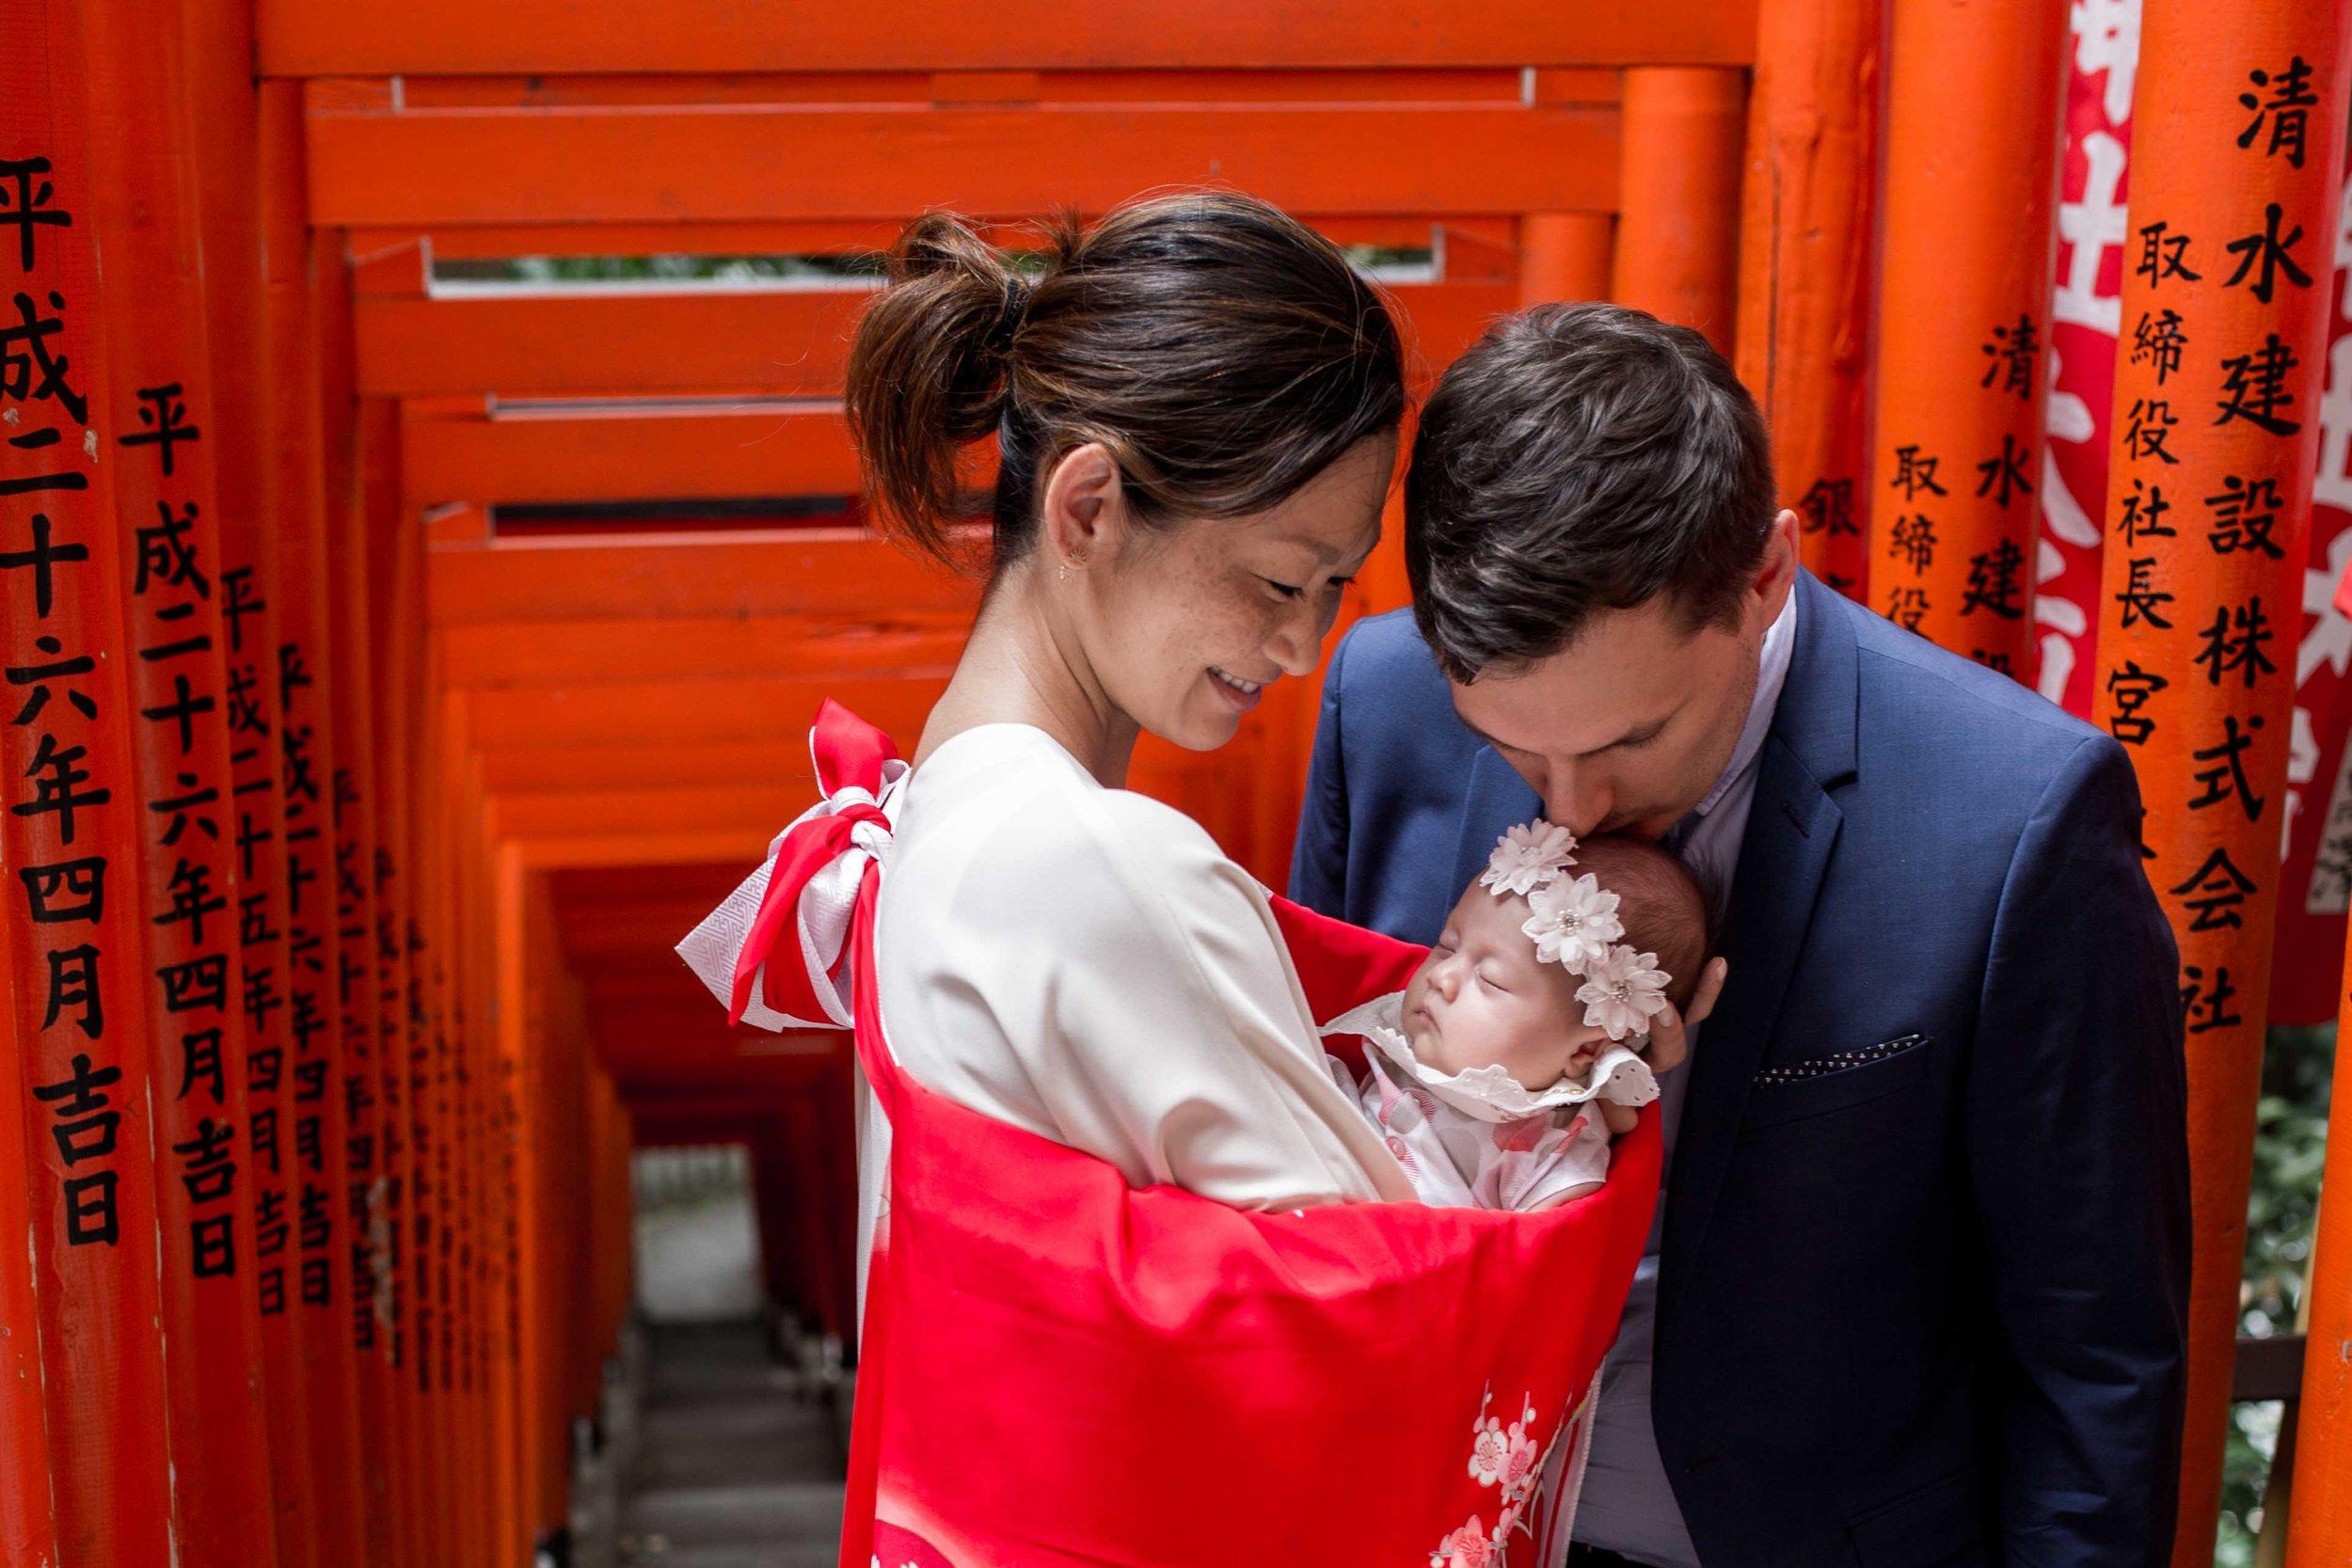 Shrine visit with a newborn (Omiya mairi)